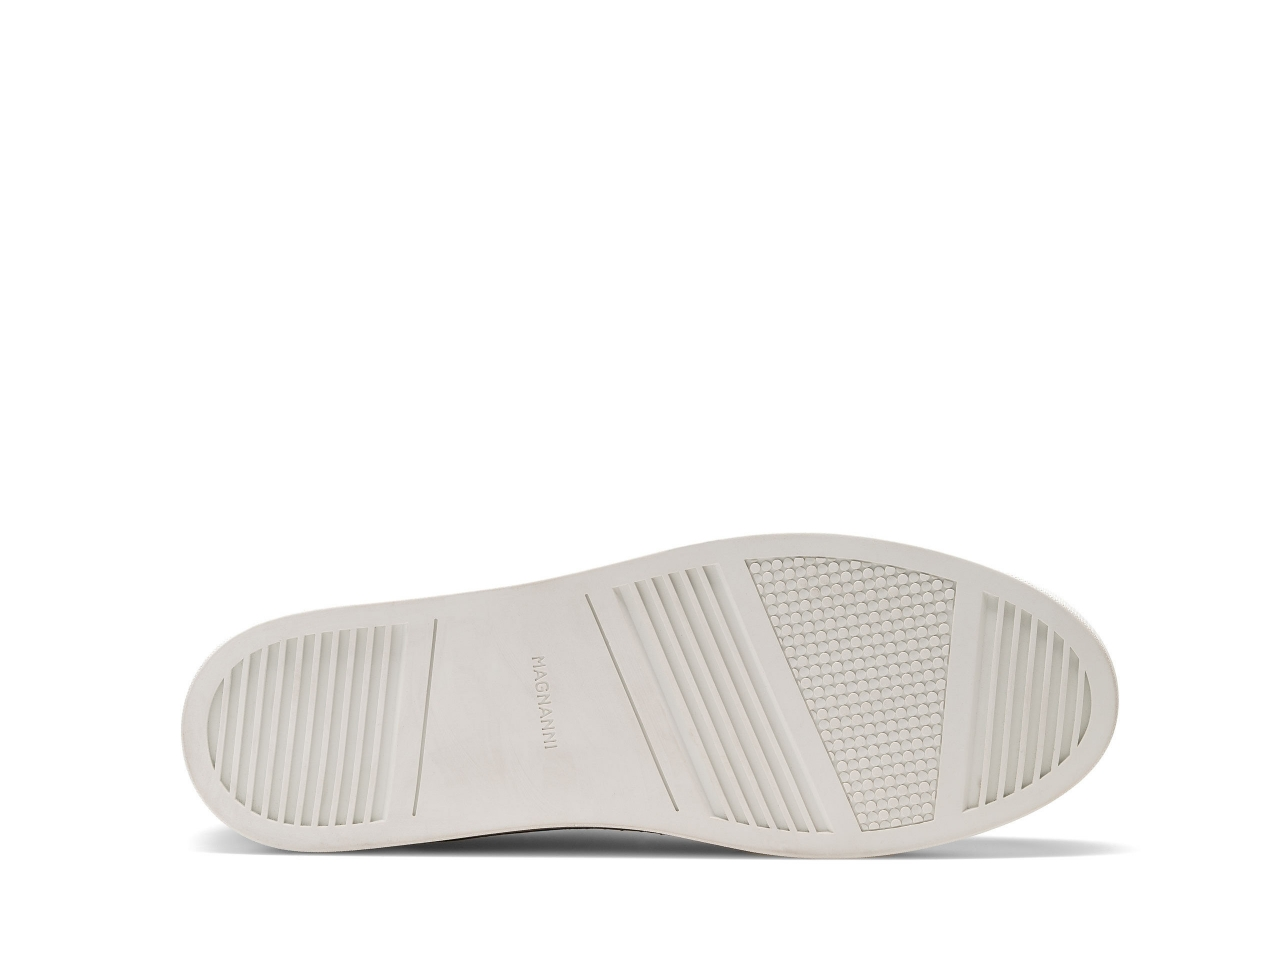 The sole of the Ruente